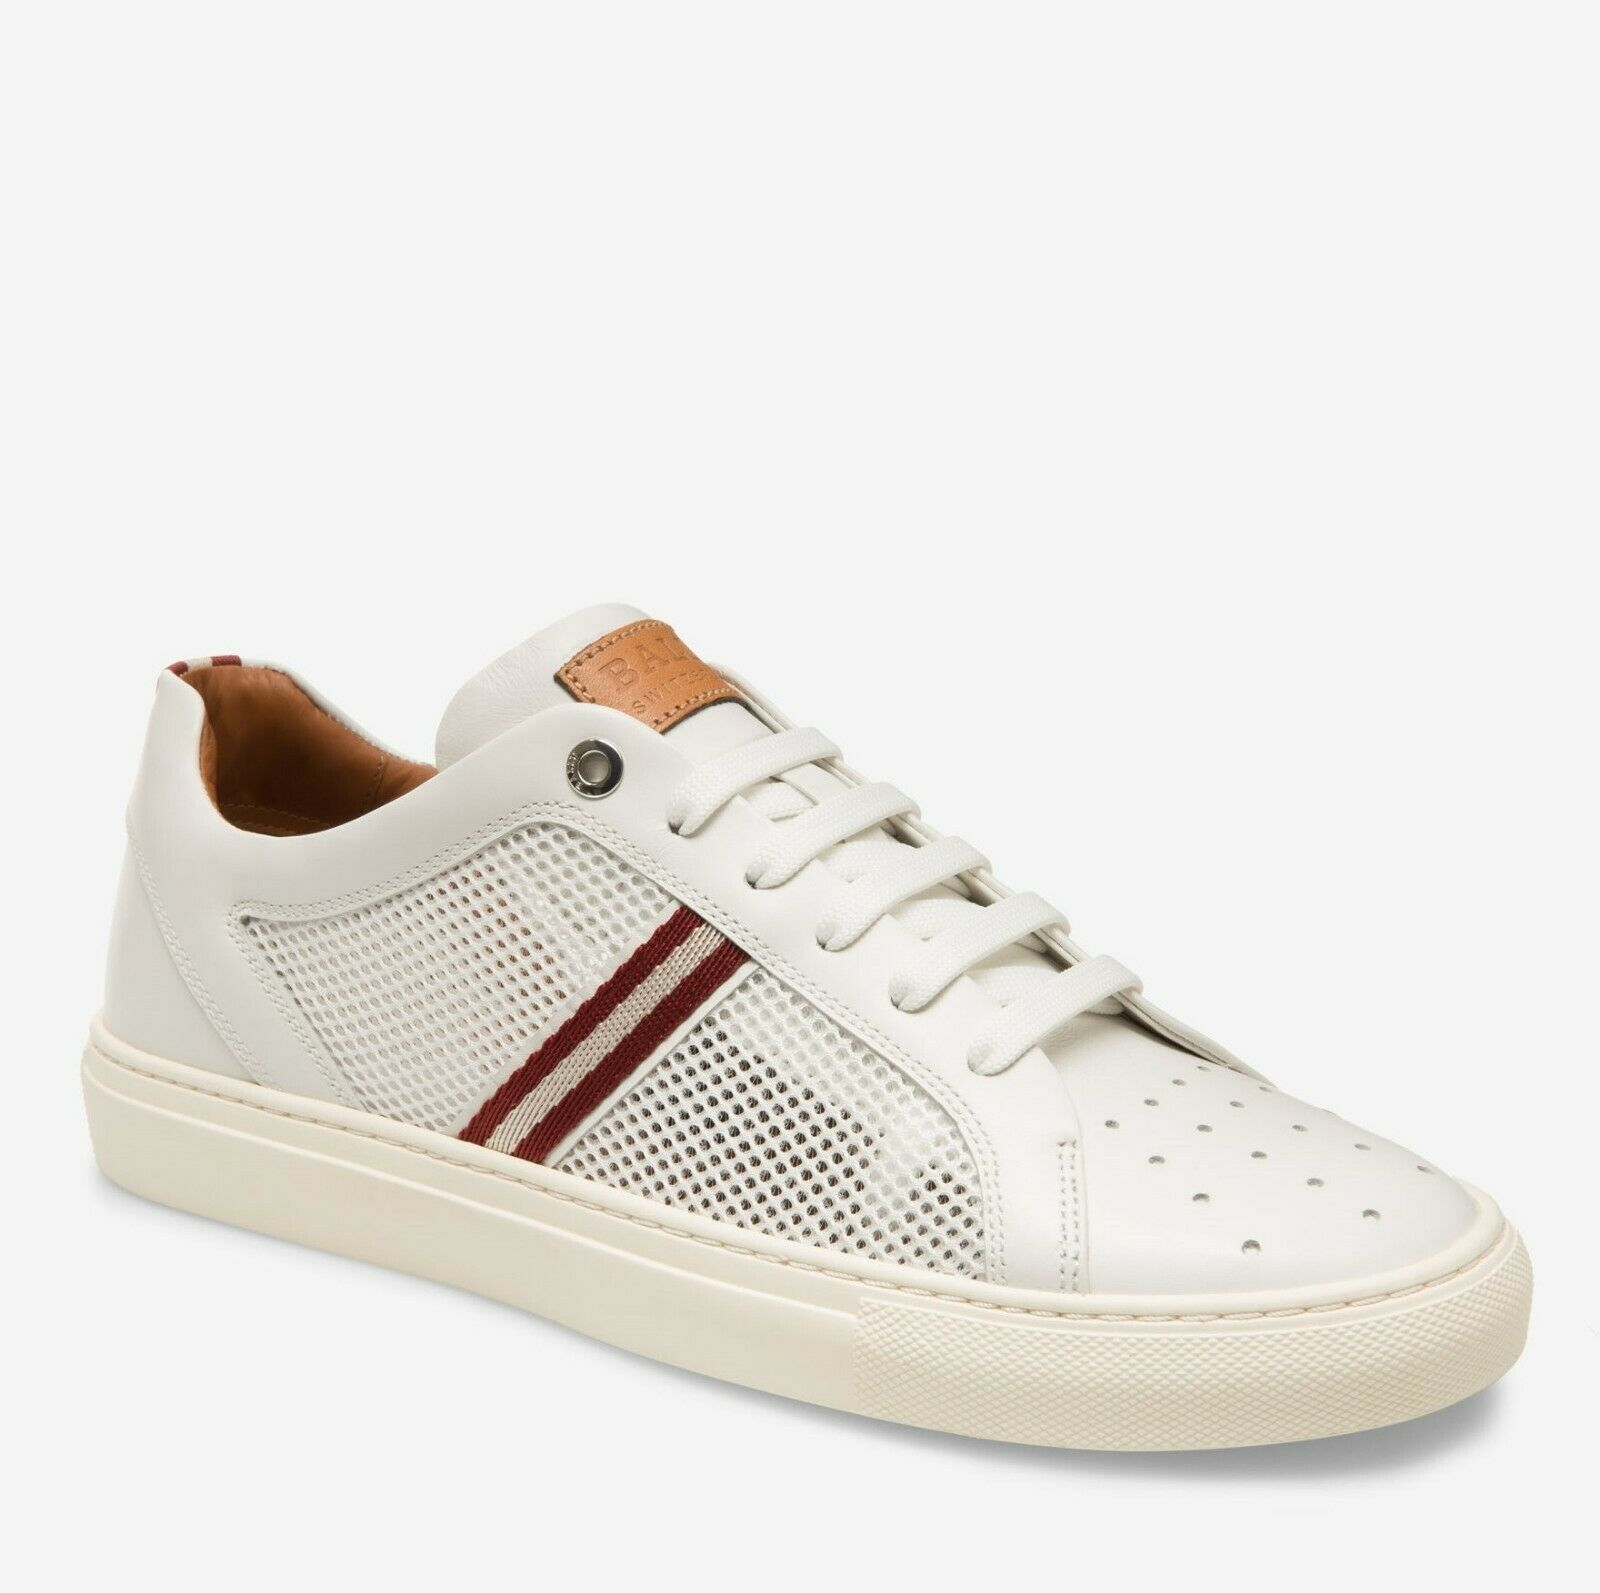 Bally Men's White Calf Leather Sneakers w Red Beige Web 11D Herk-U-07